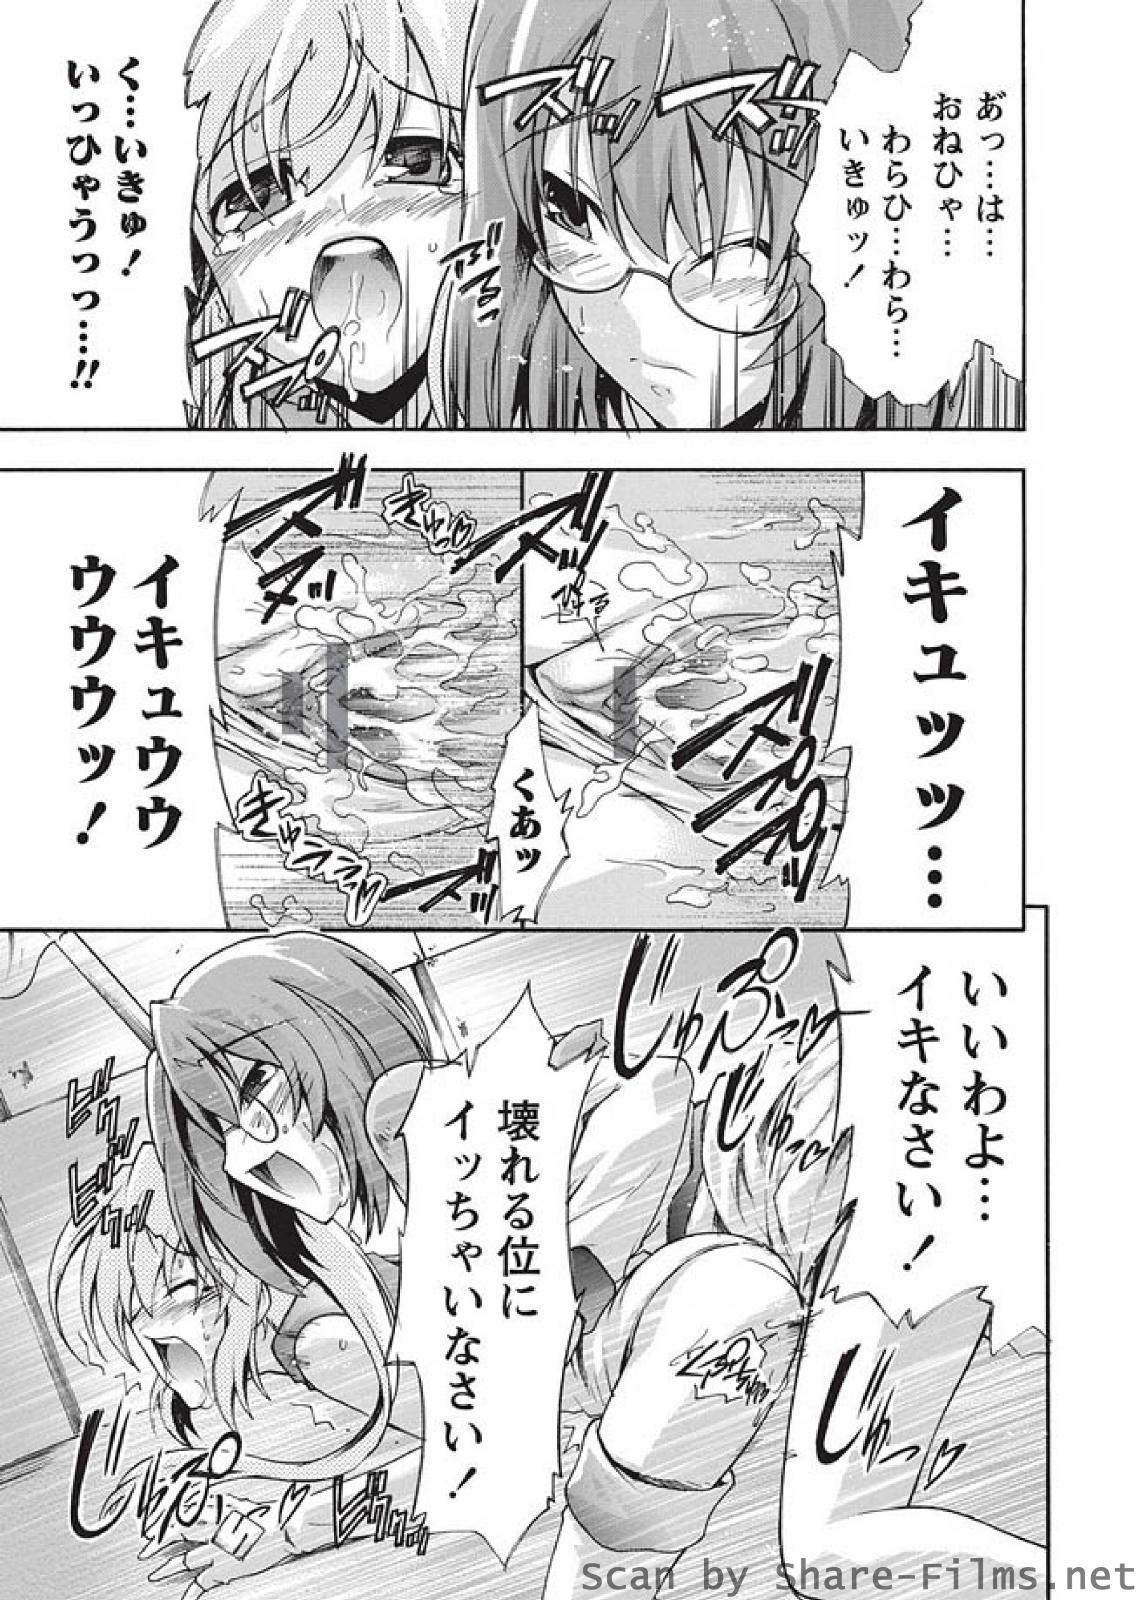 Karyou Sakuragumi Etsu 89